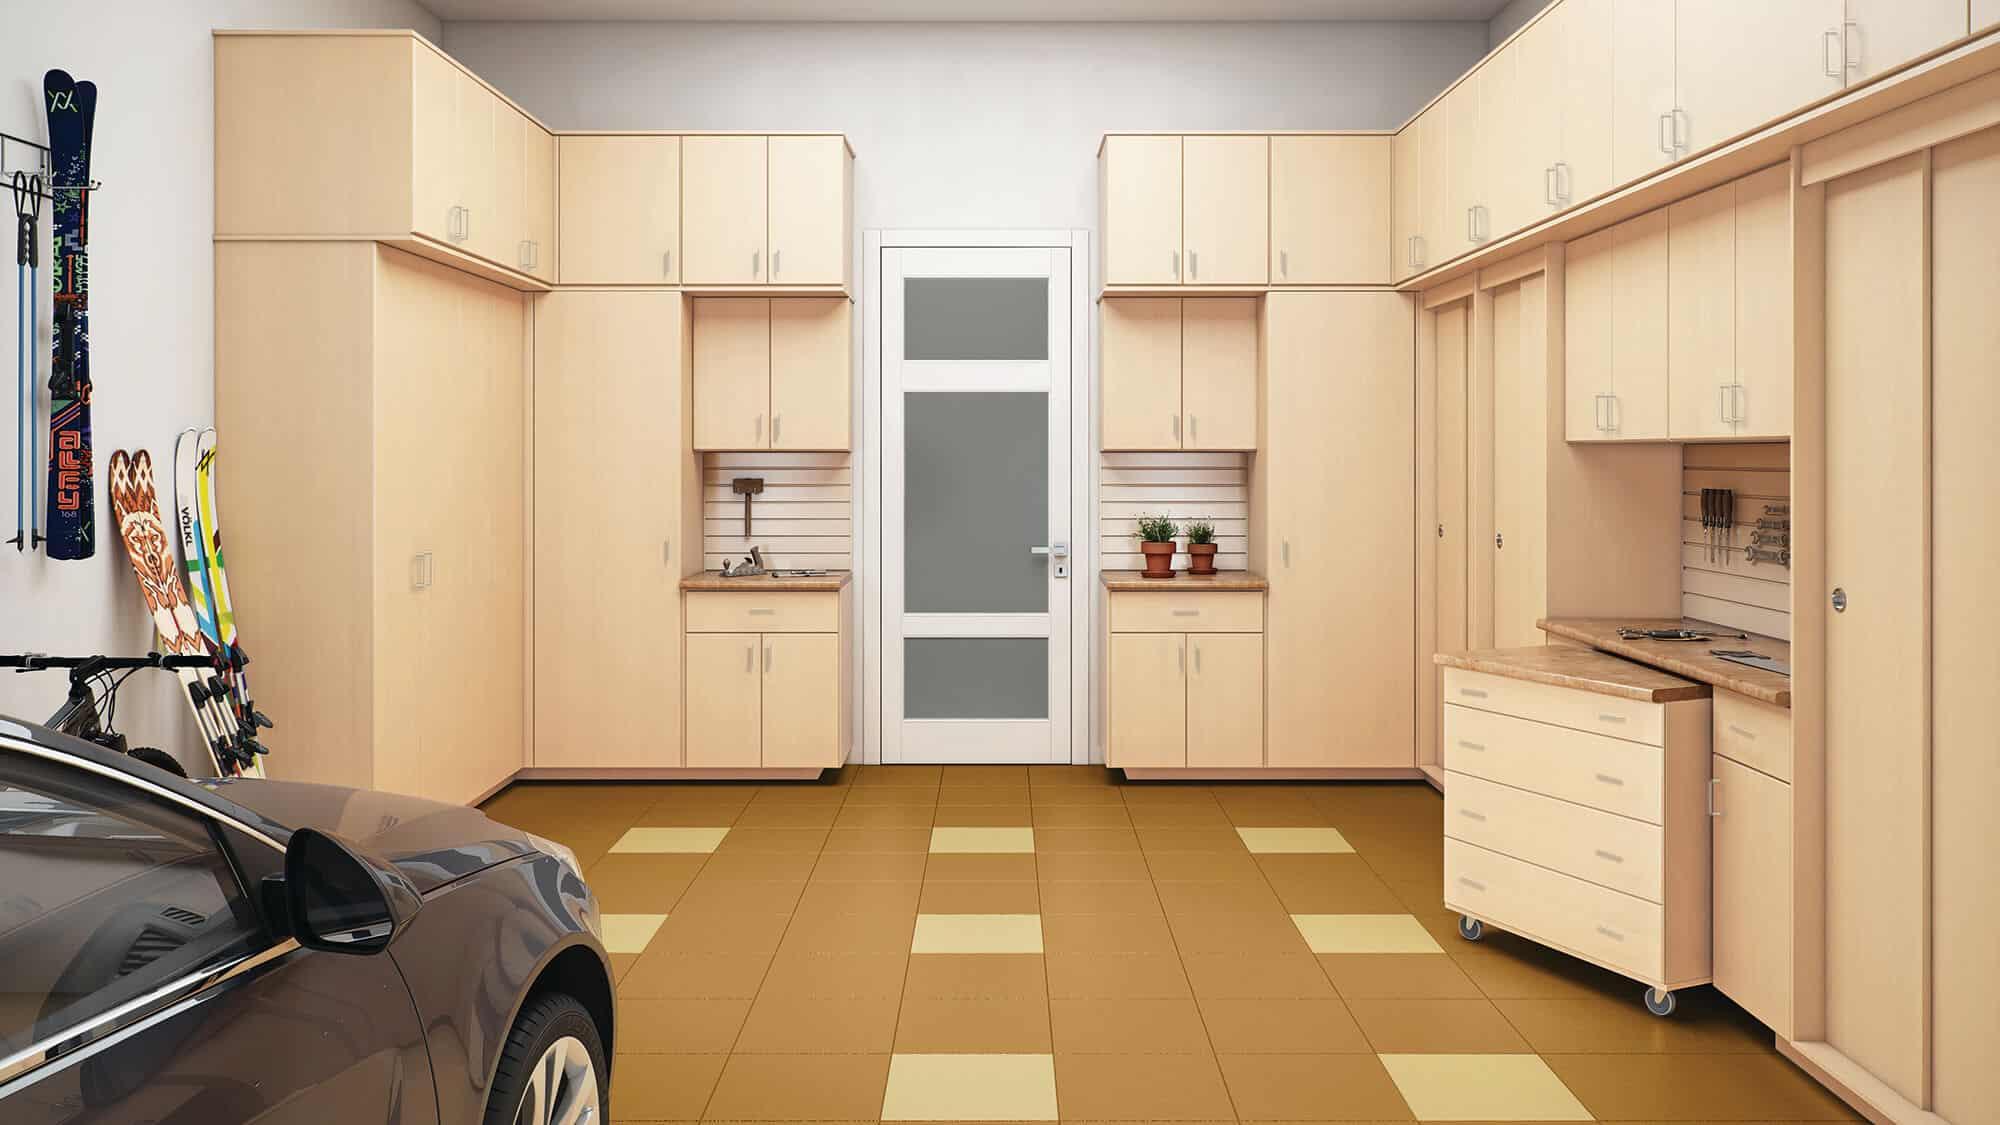 An organized custom garage from Closets by Design.